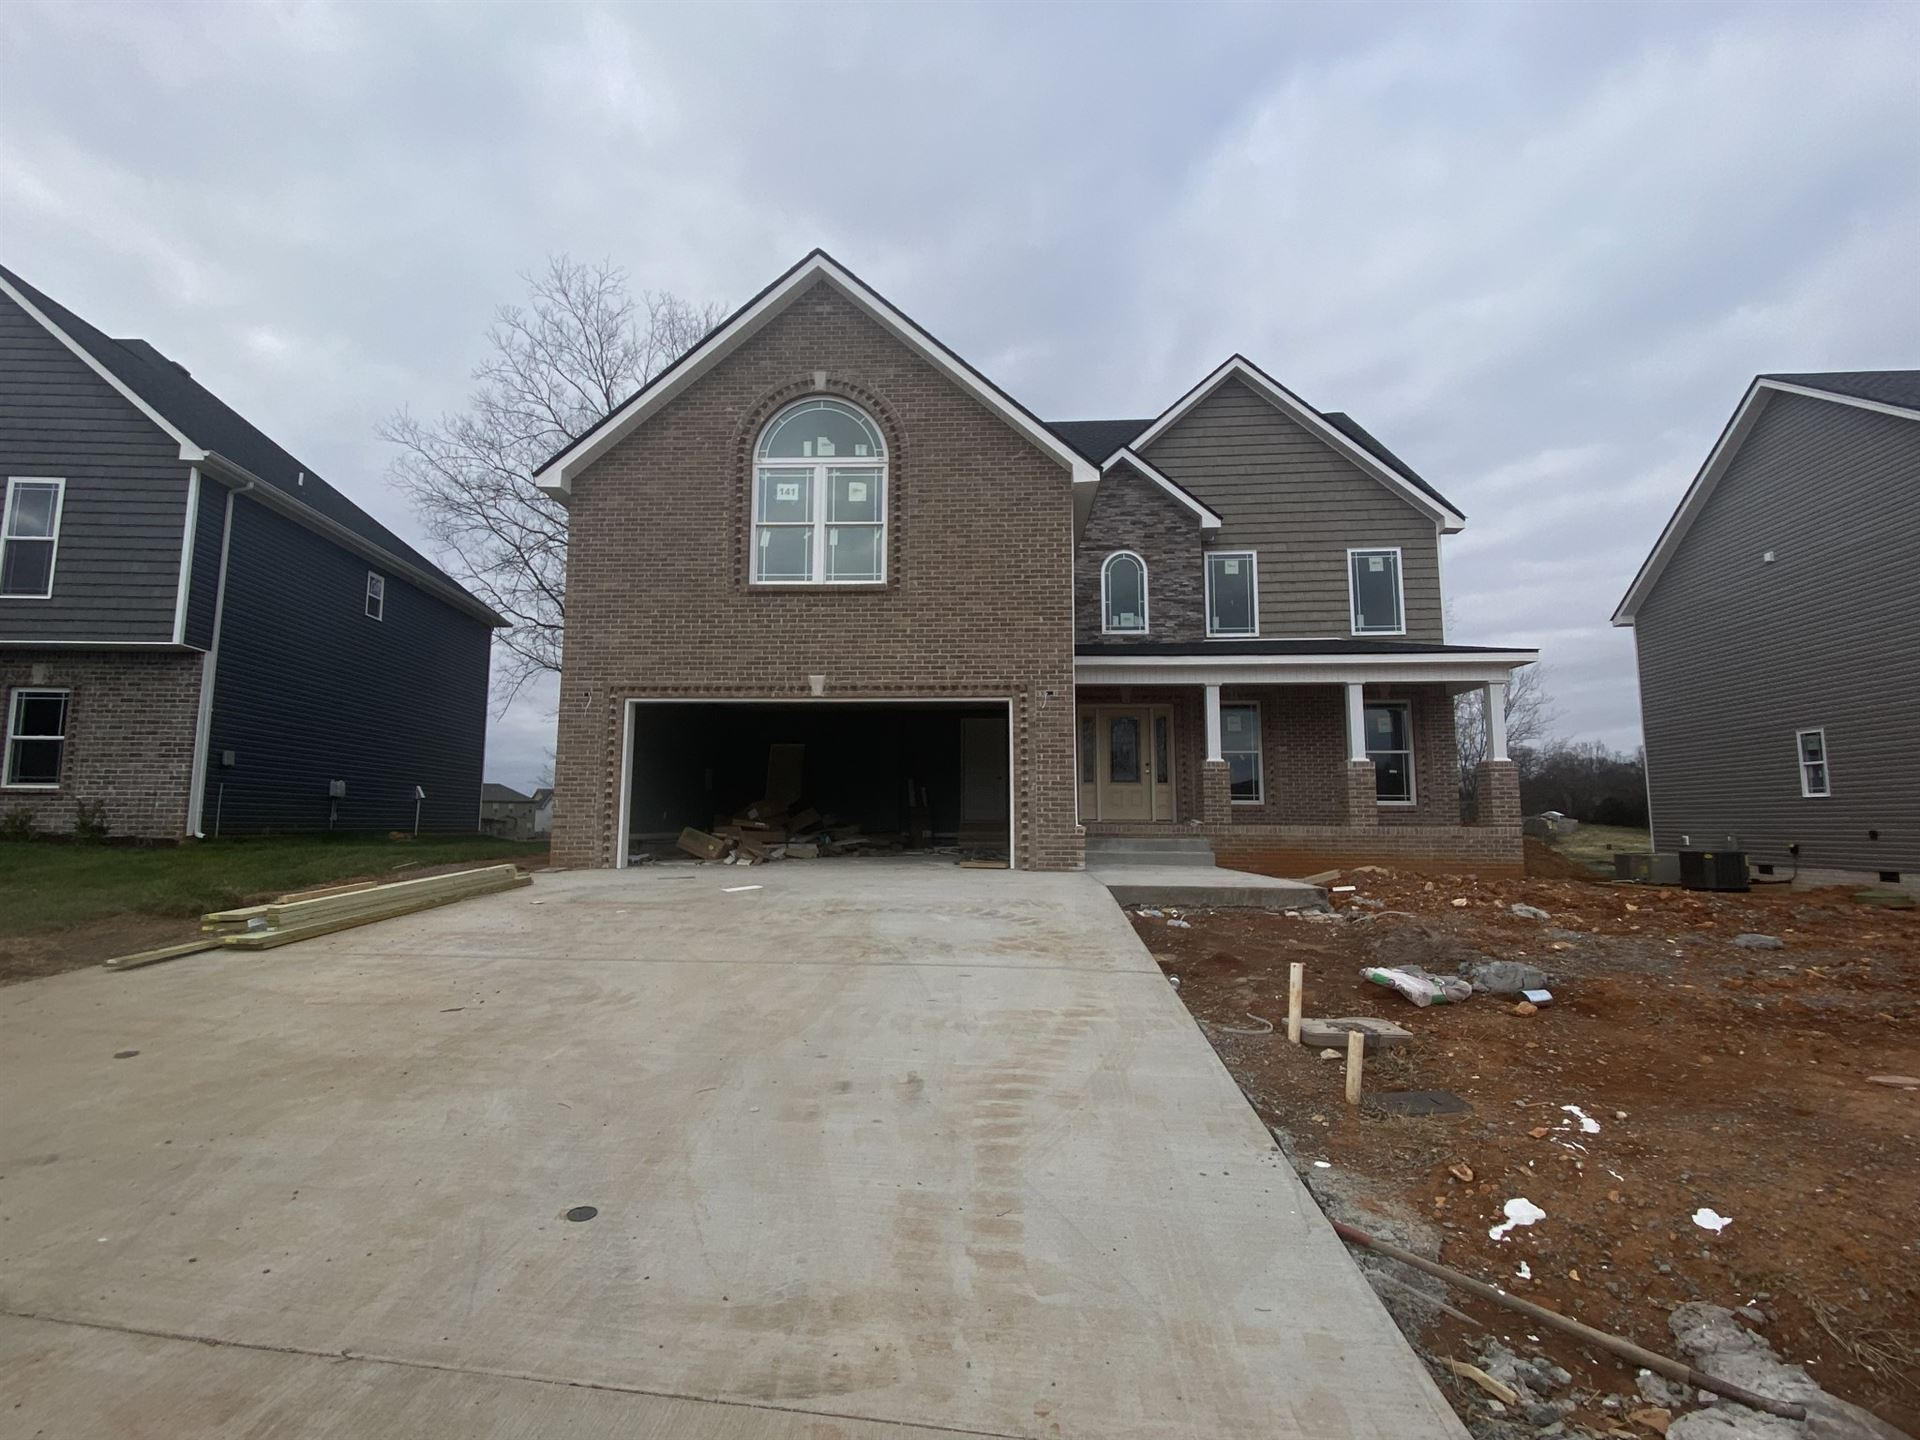 912 Burley Barn Rd, Clarksville, TN 37042 - MLS#: 2273223